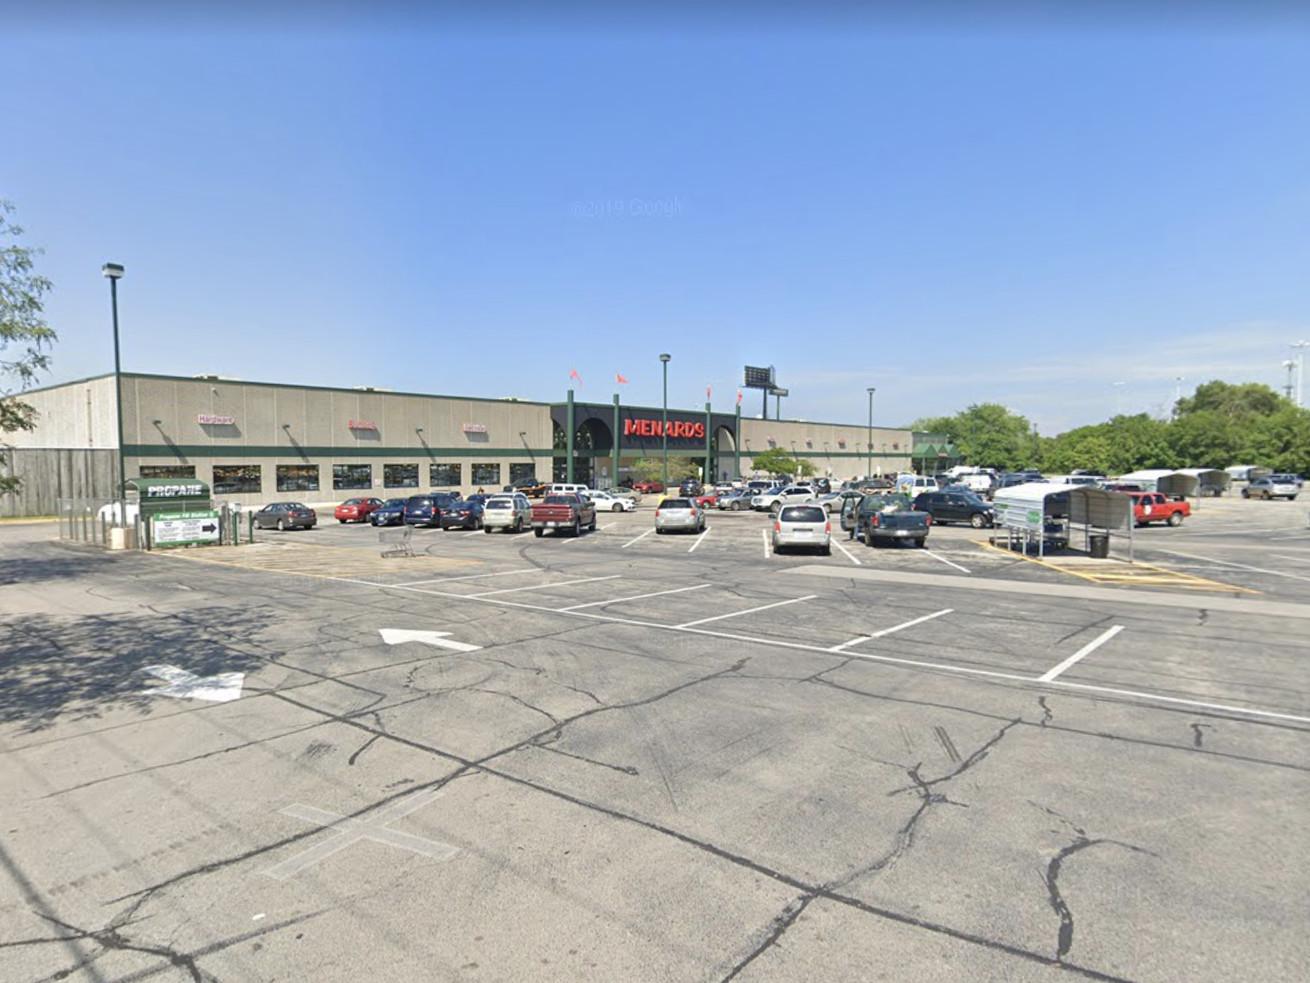 Dolton Menards, 14975 Lincoln Ave.